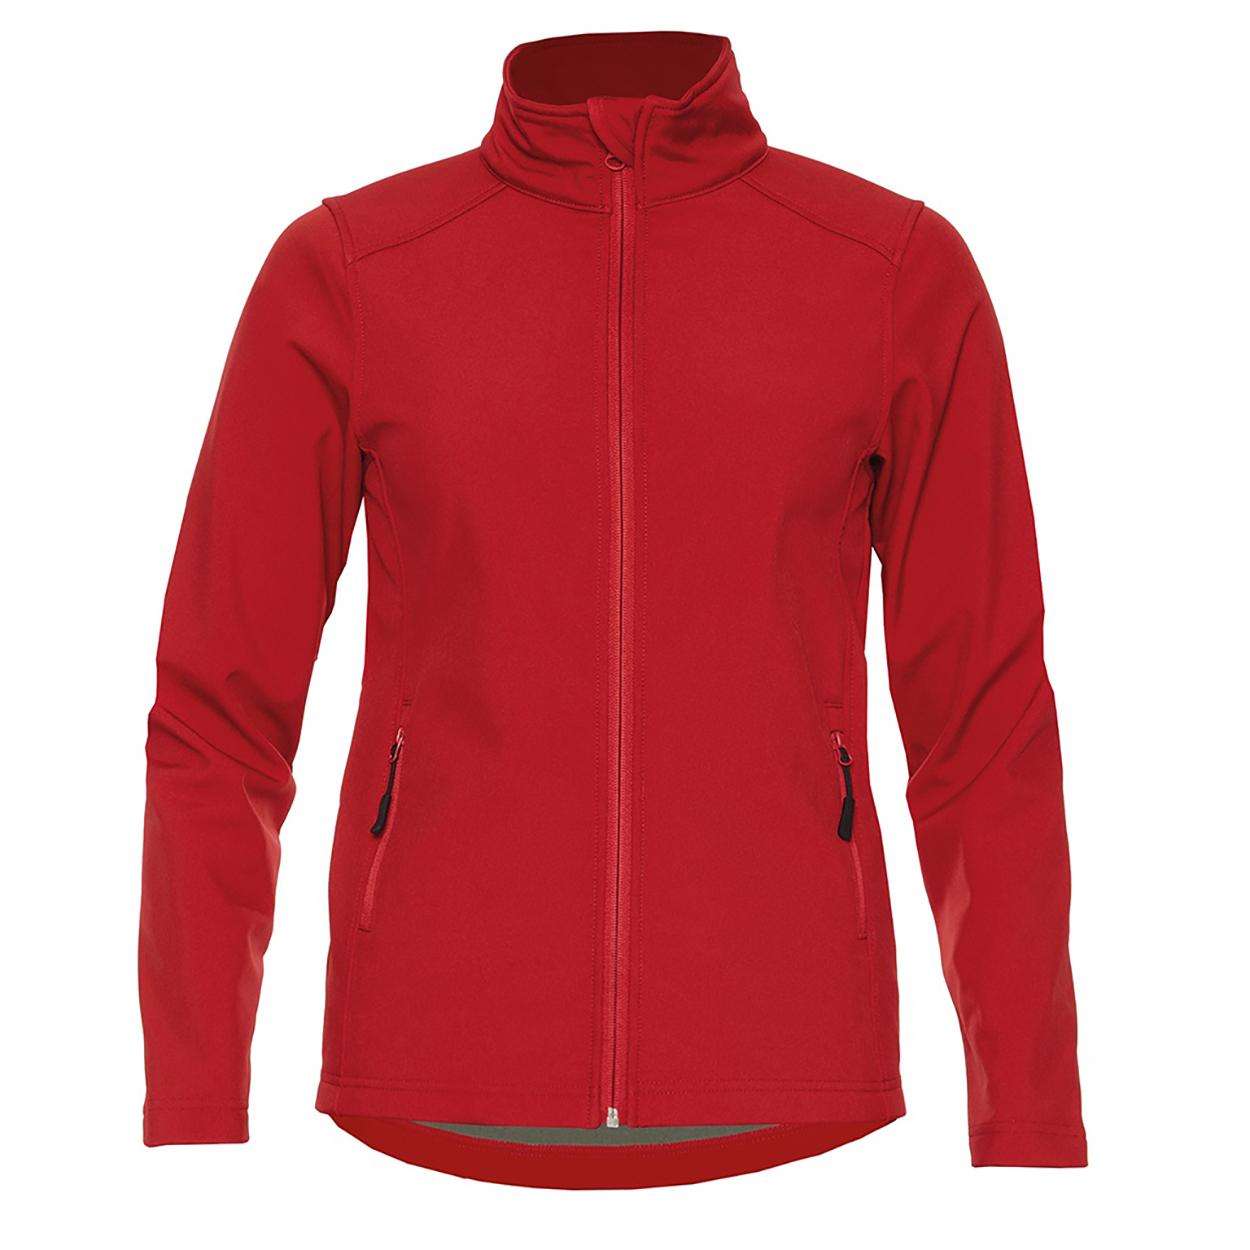 Gildan Womens/Ladies Hammer Soft Shell Jacket (XXL) (Red)